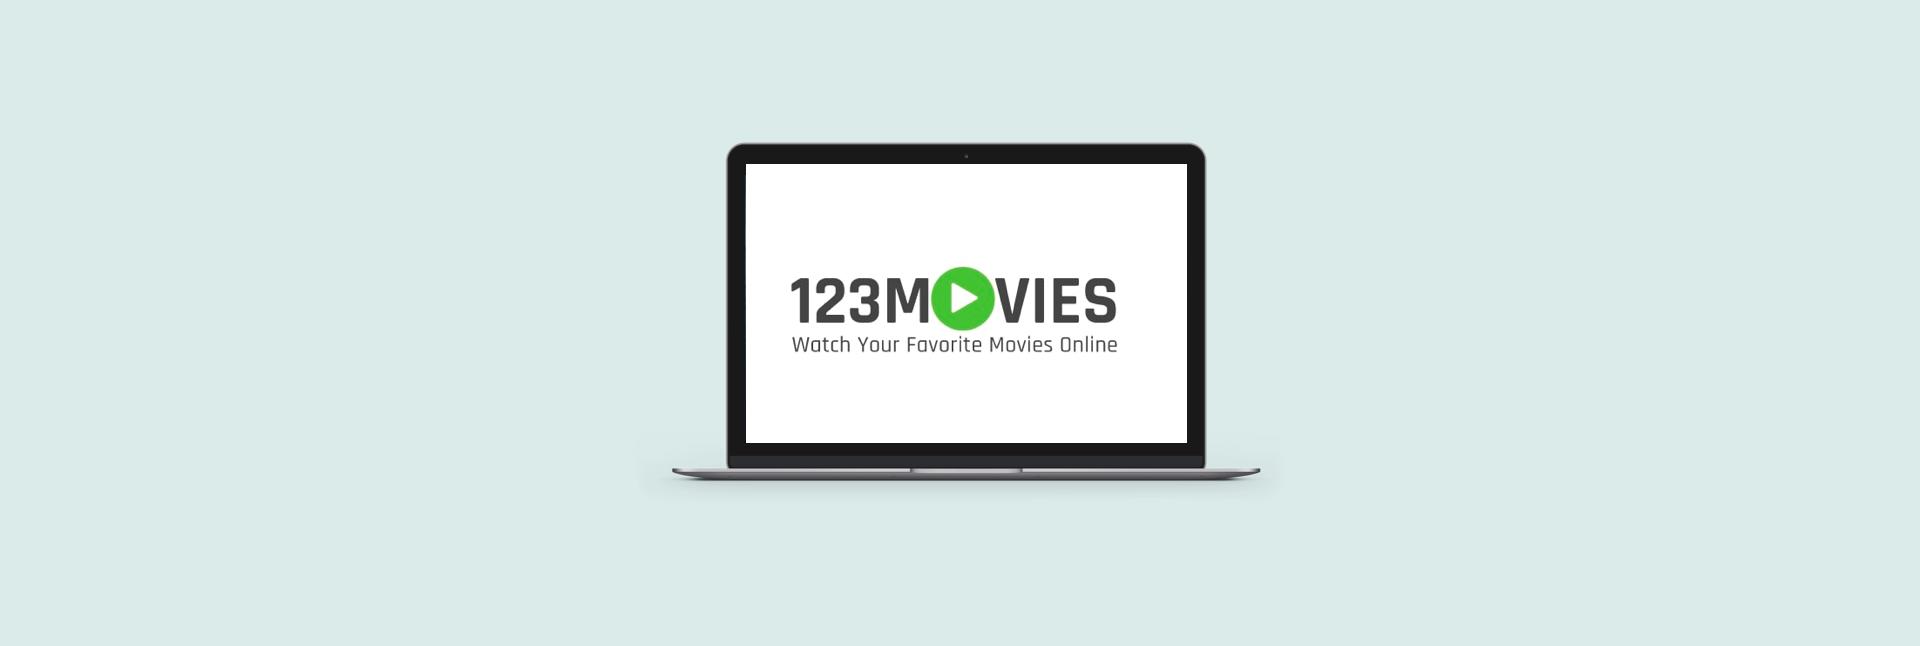 123 movies new website